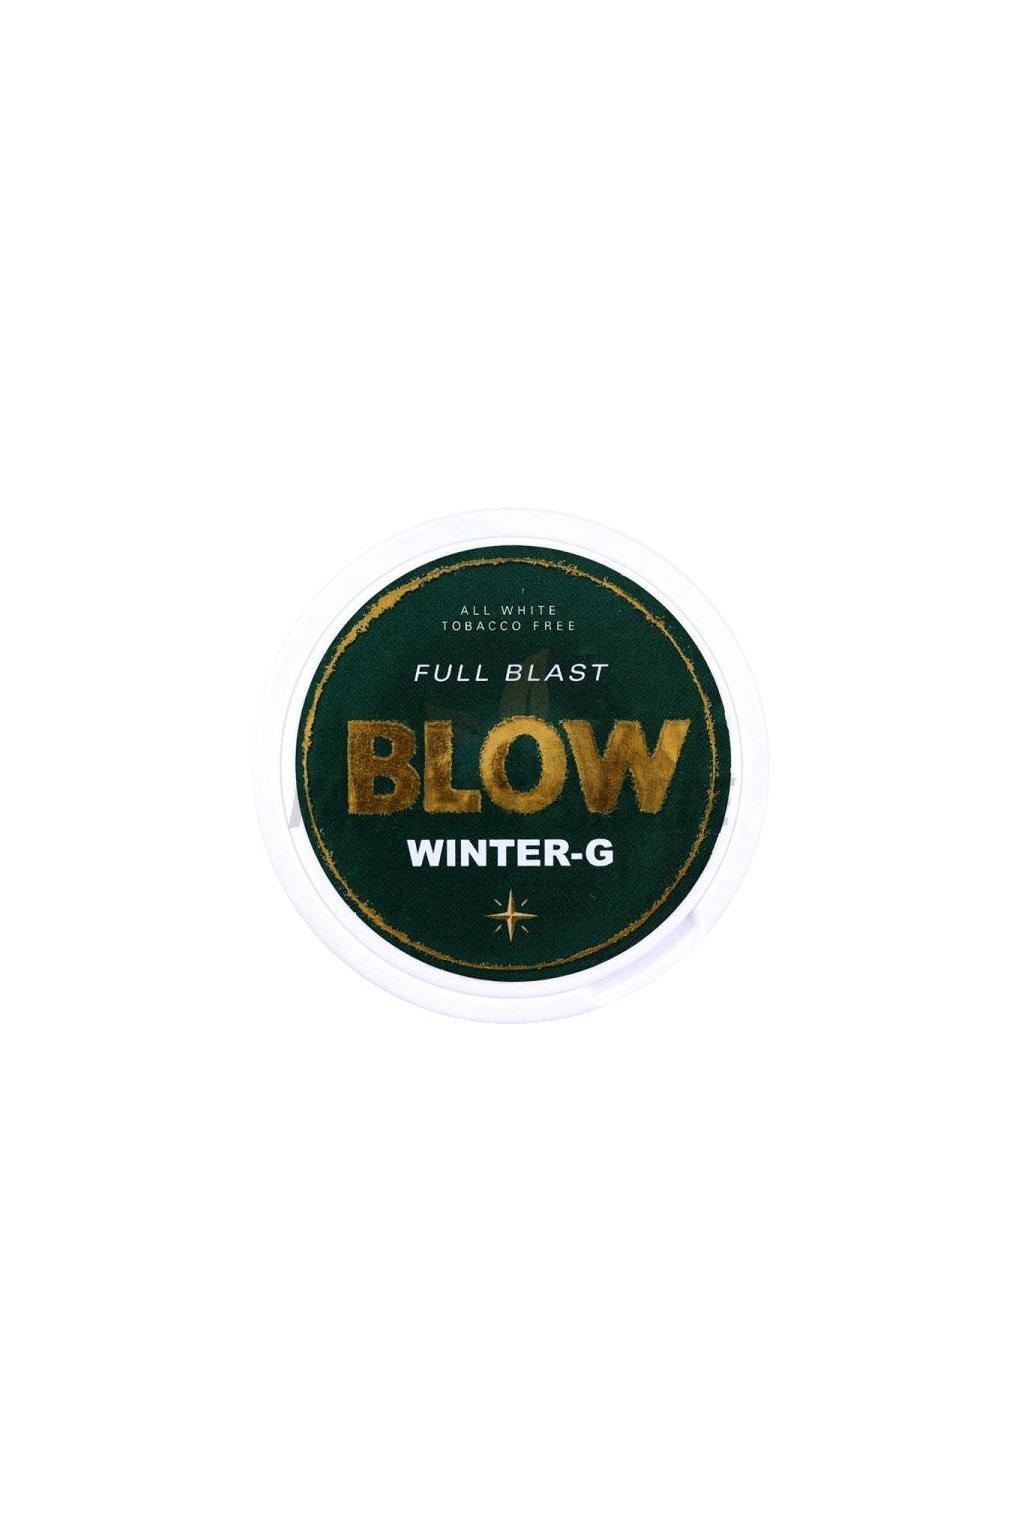 Blow wintergreen nikotinove sacky